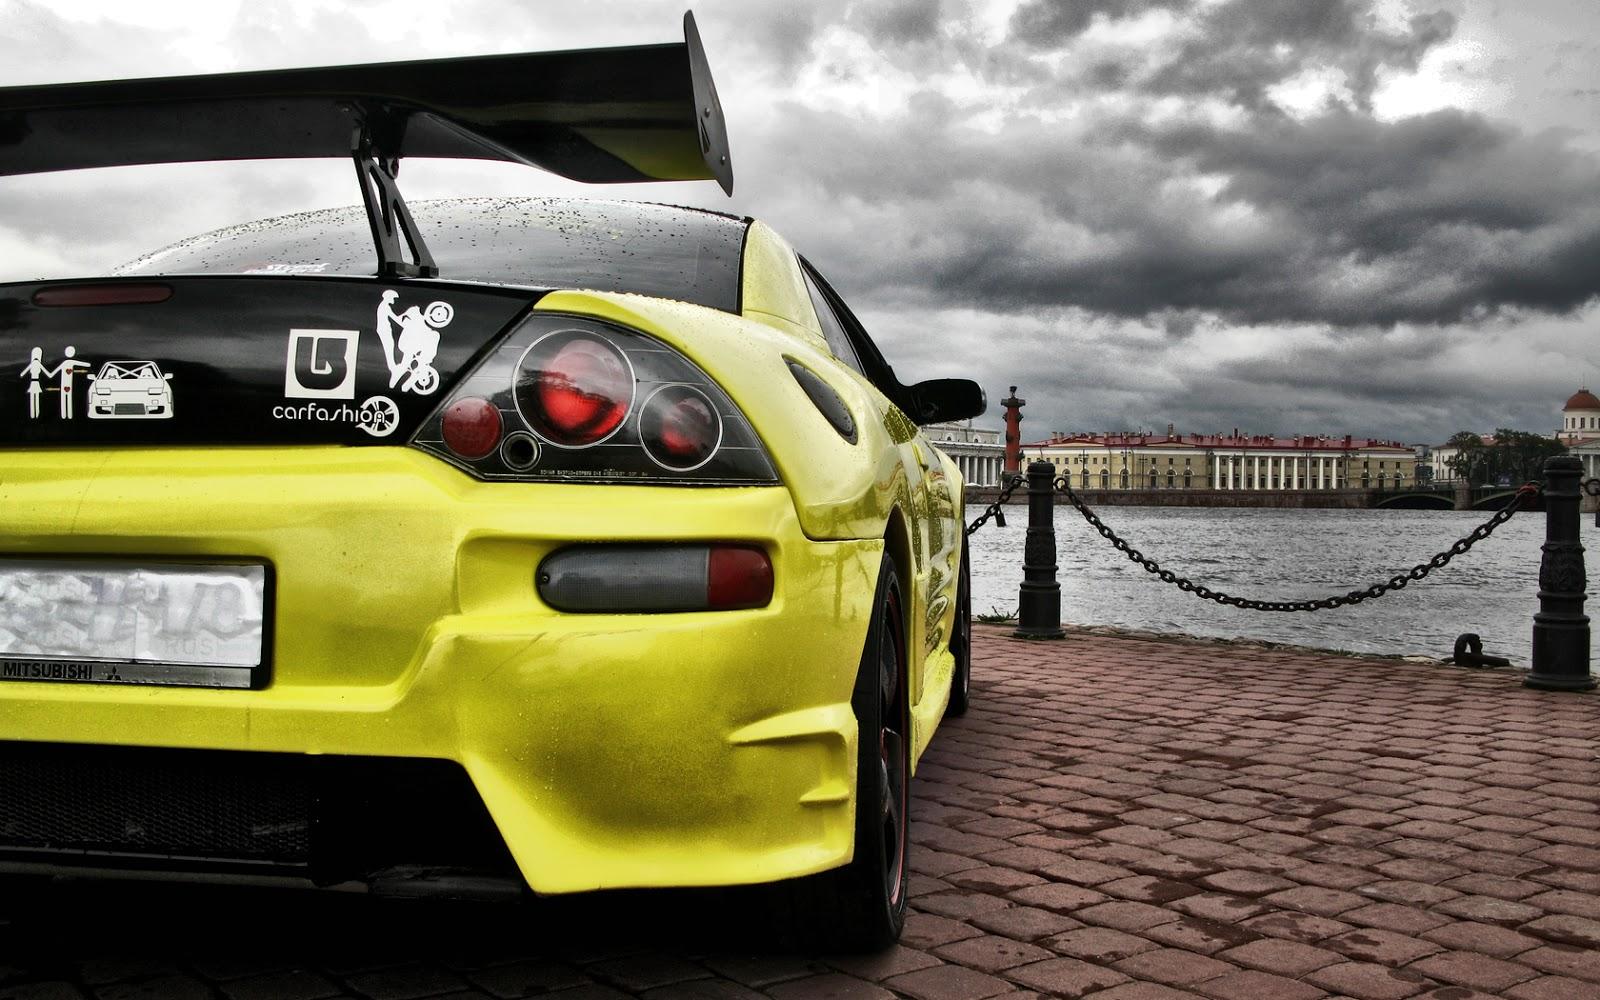 http://1.bp.blogspot.com/-Z1Nkhbt9vAg/UNnILM73JCI/AAAAAAAAAOY/LDDPdM3eWS4/s1600/Mitsubishi+RVR+2013+In+Yellow+Wallpapers.jpg